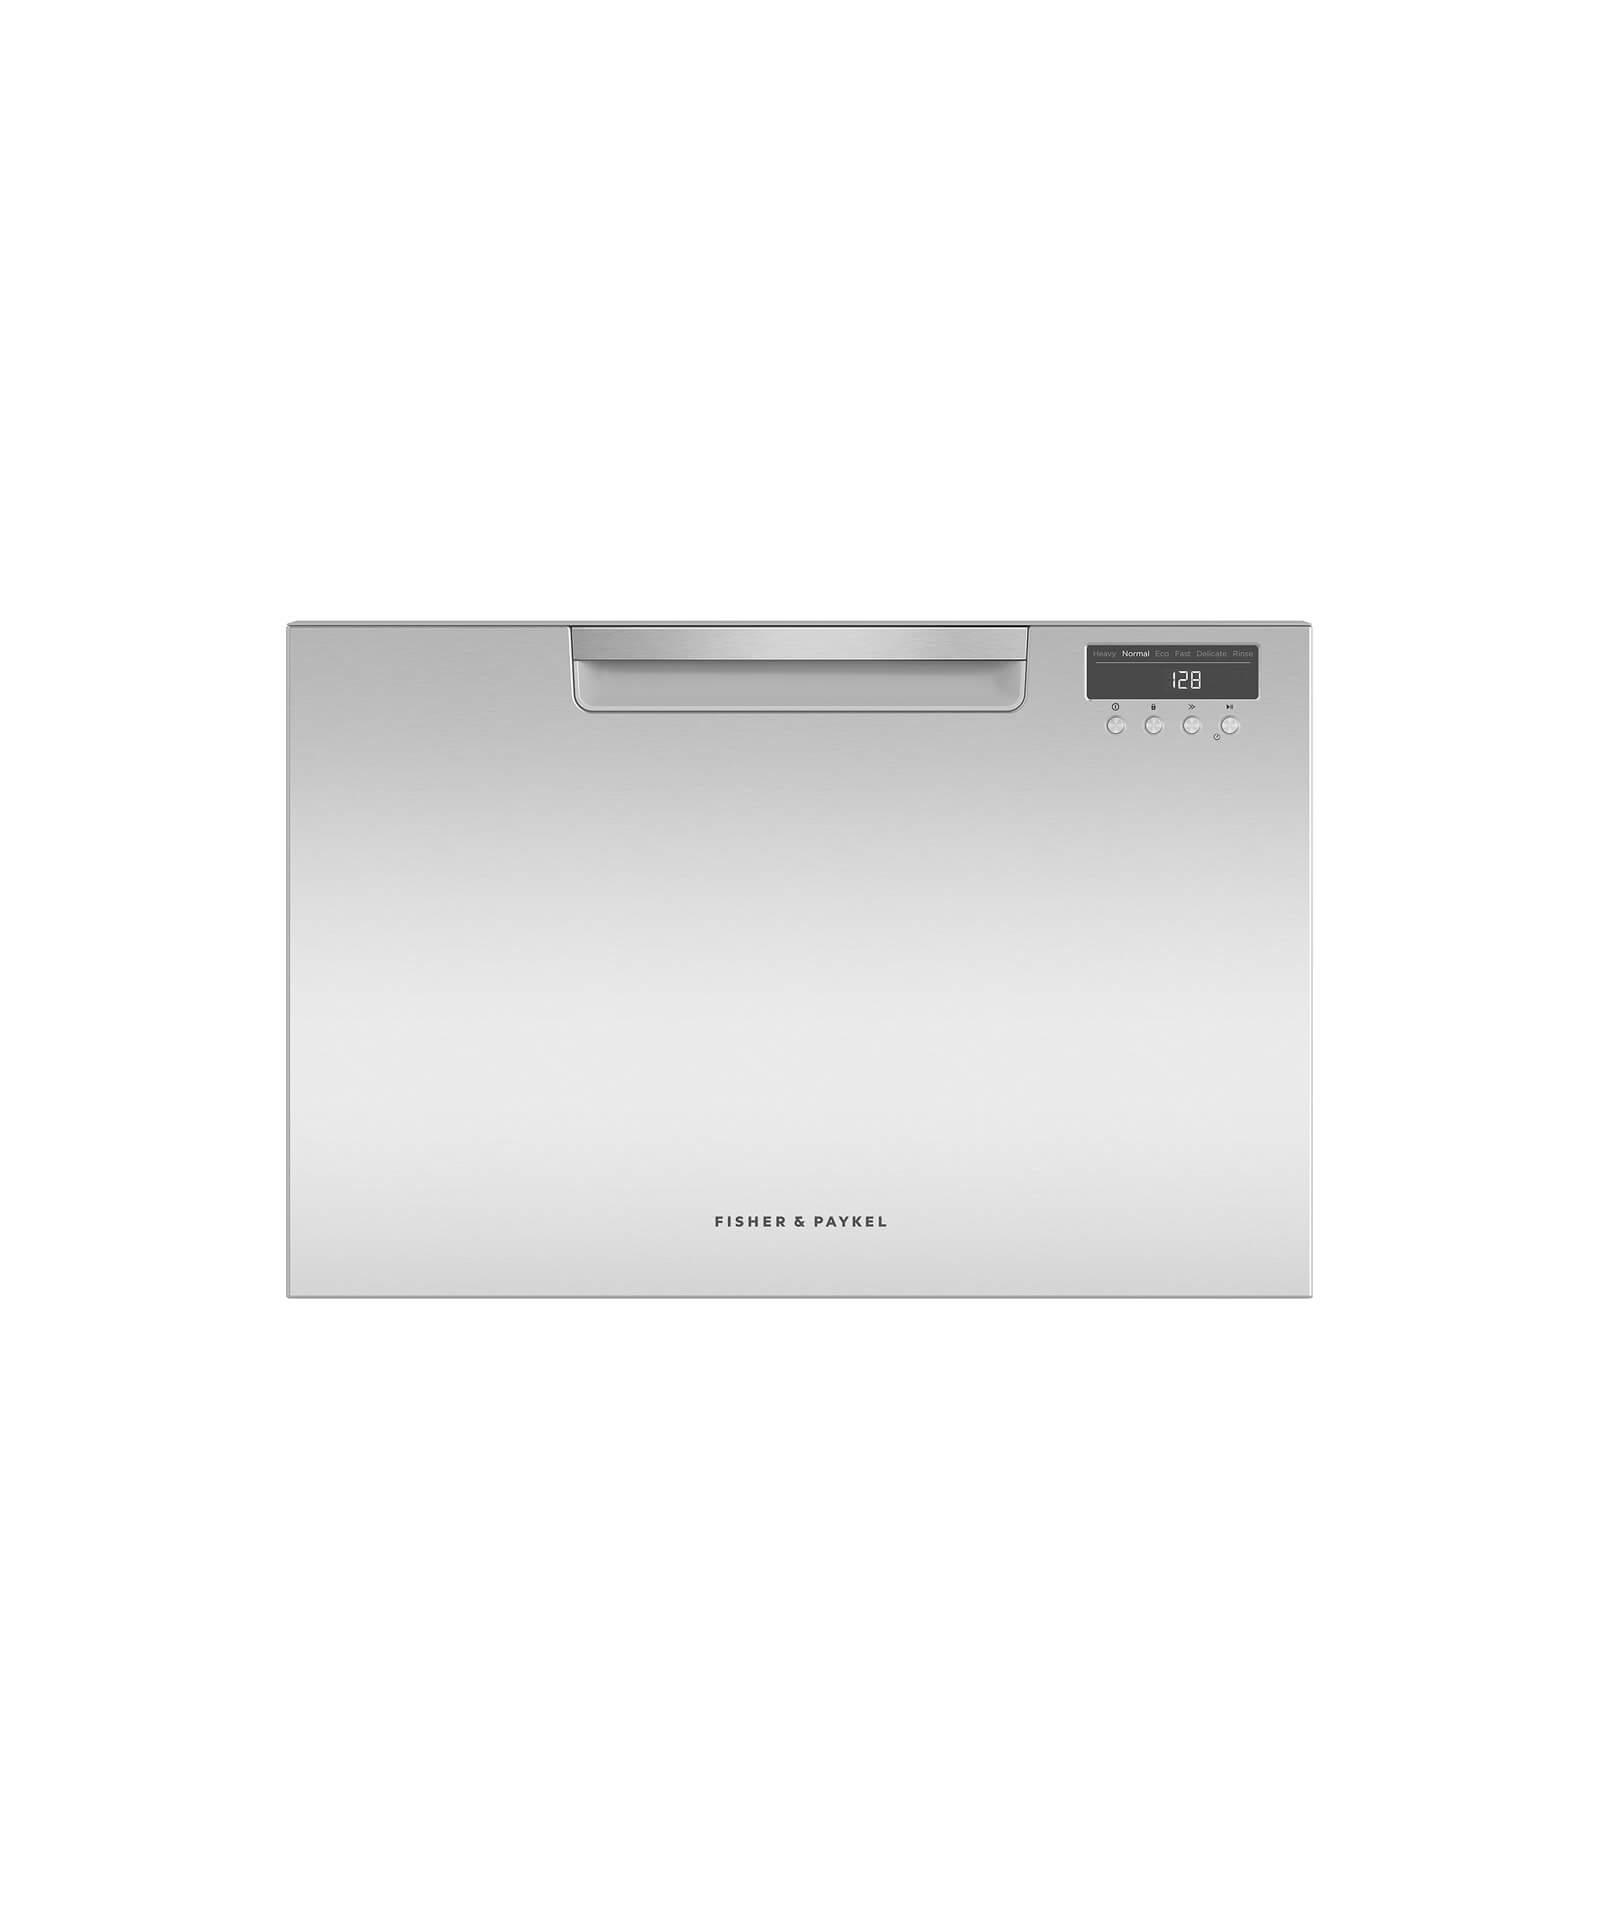 Single DishDrawer™ Dishwasher, 7 Place Settings